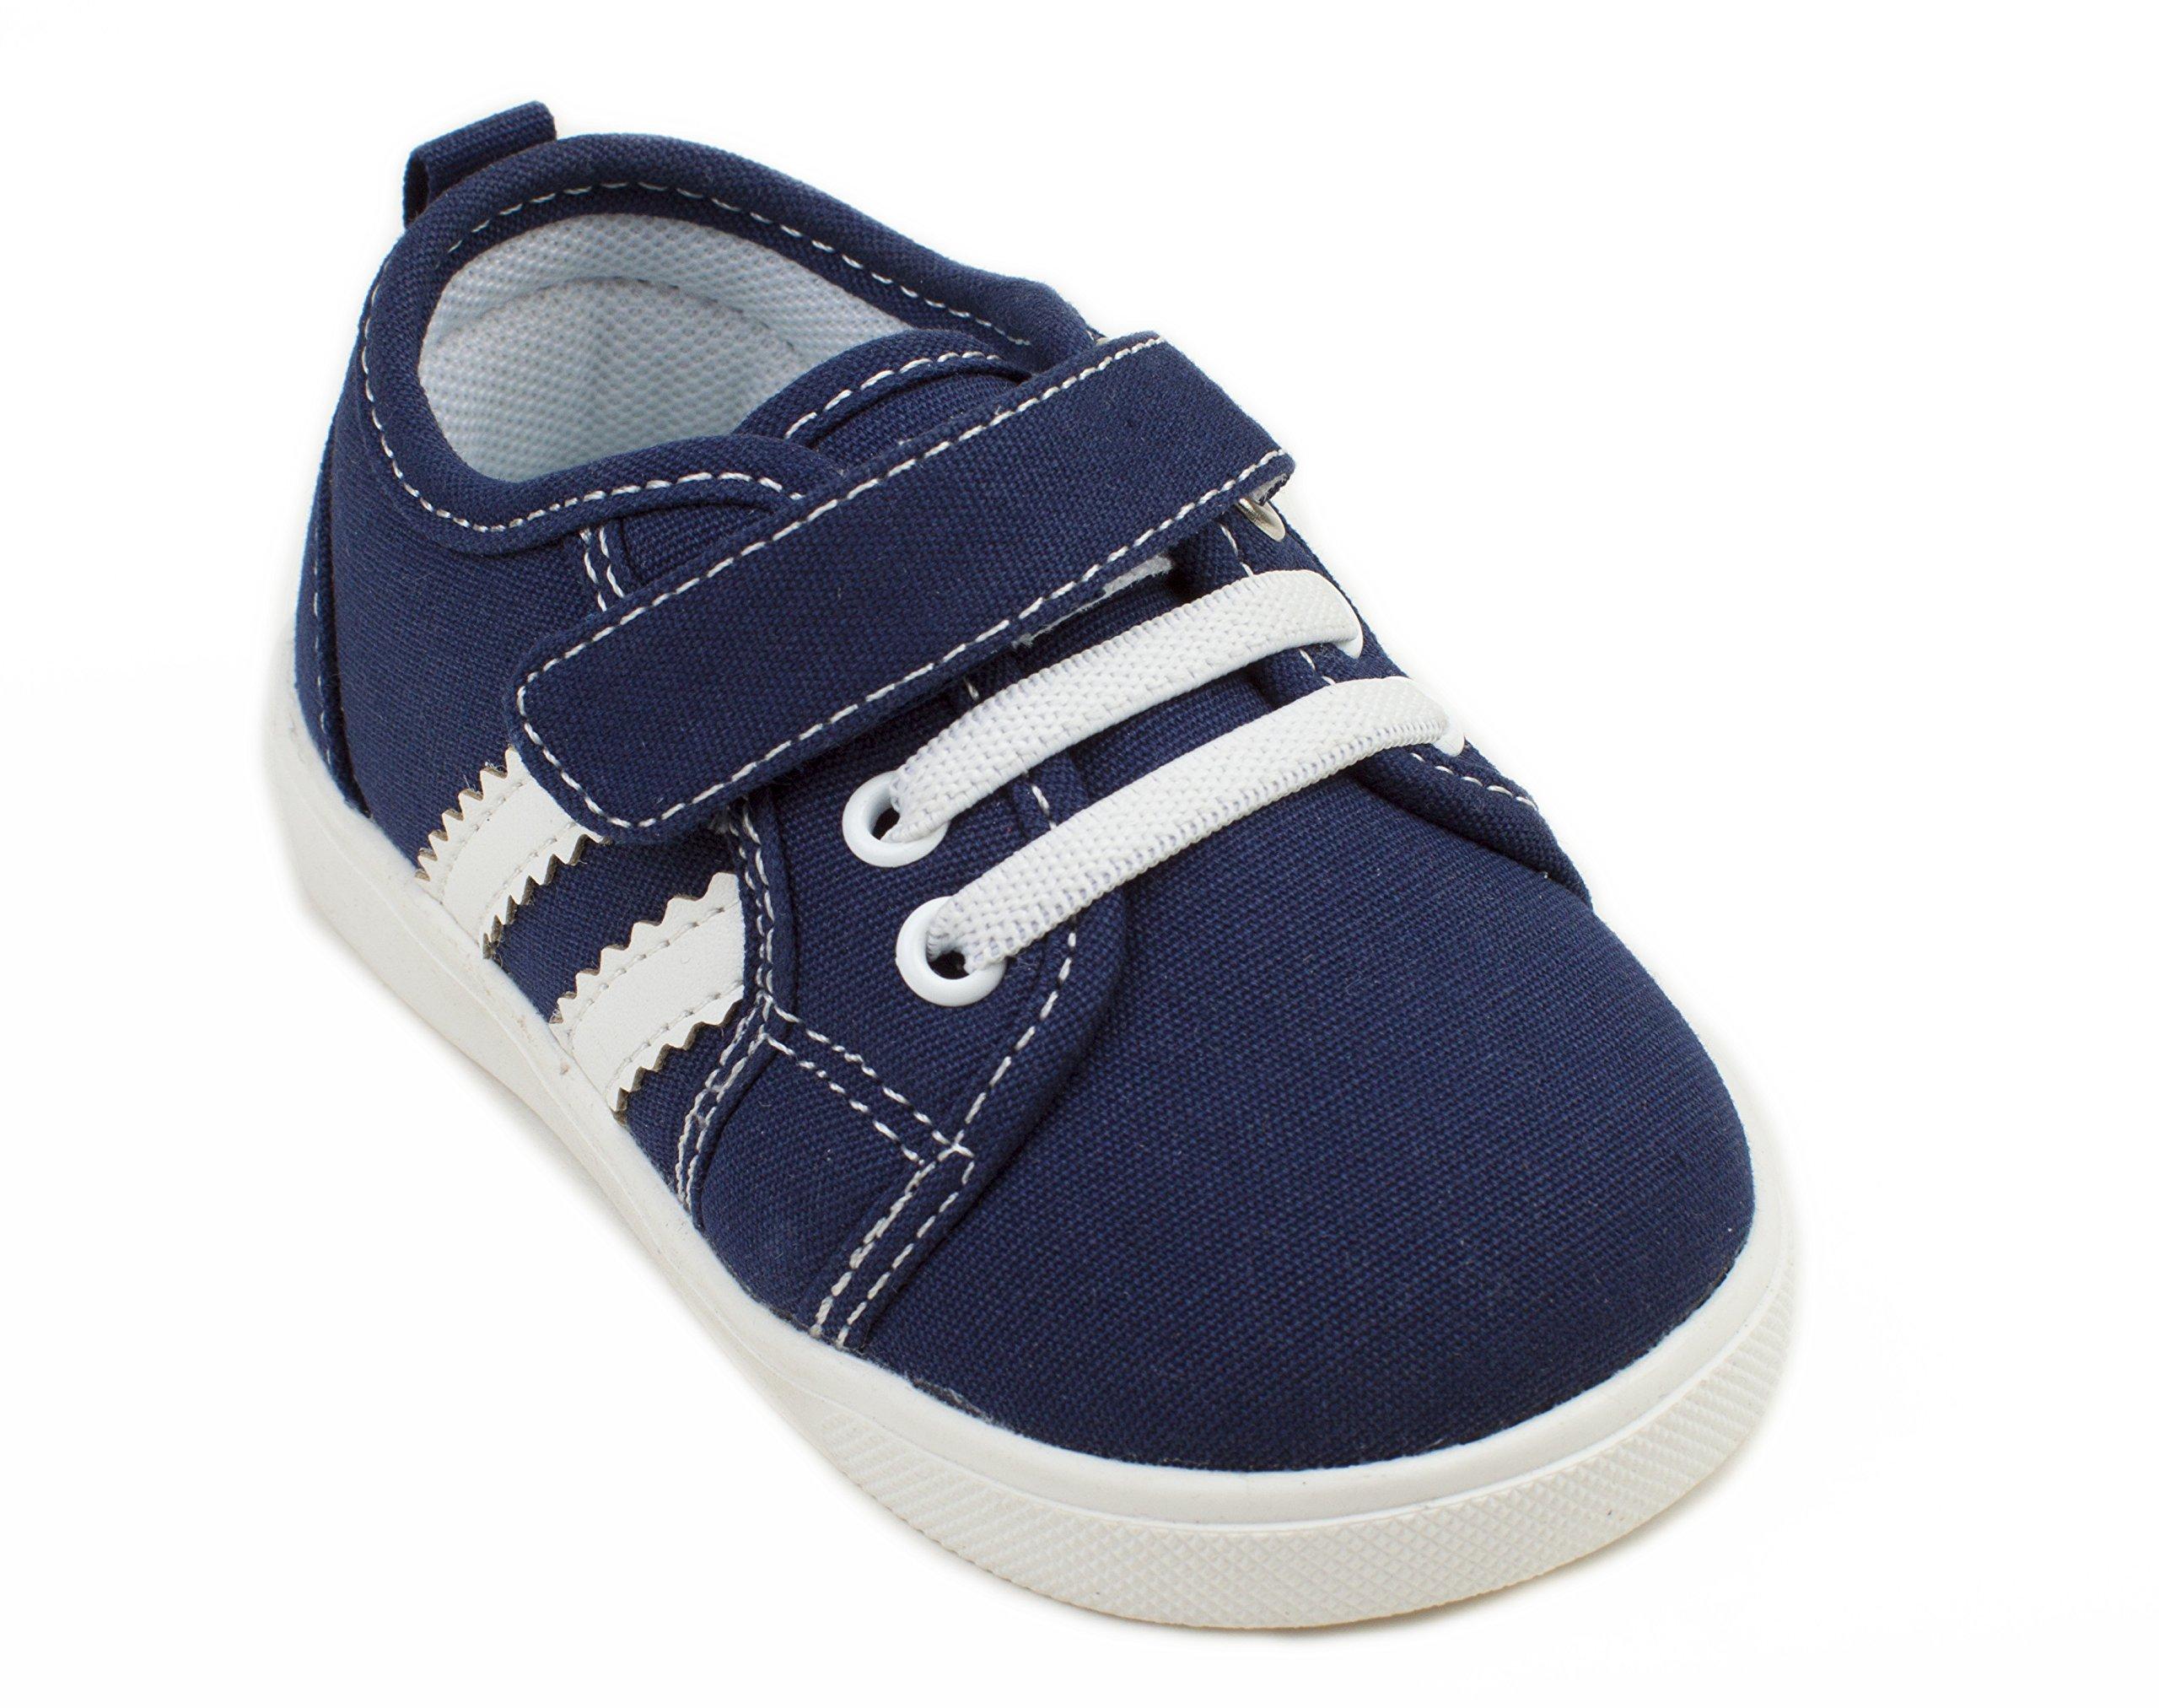 Wee Squeak Tennis Shoe Navy - Size 4